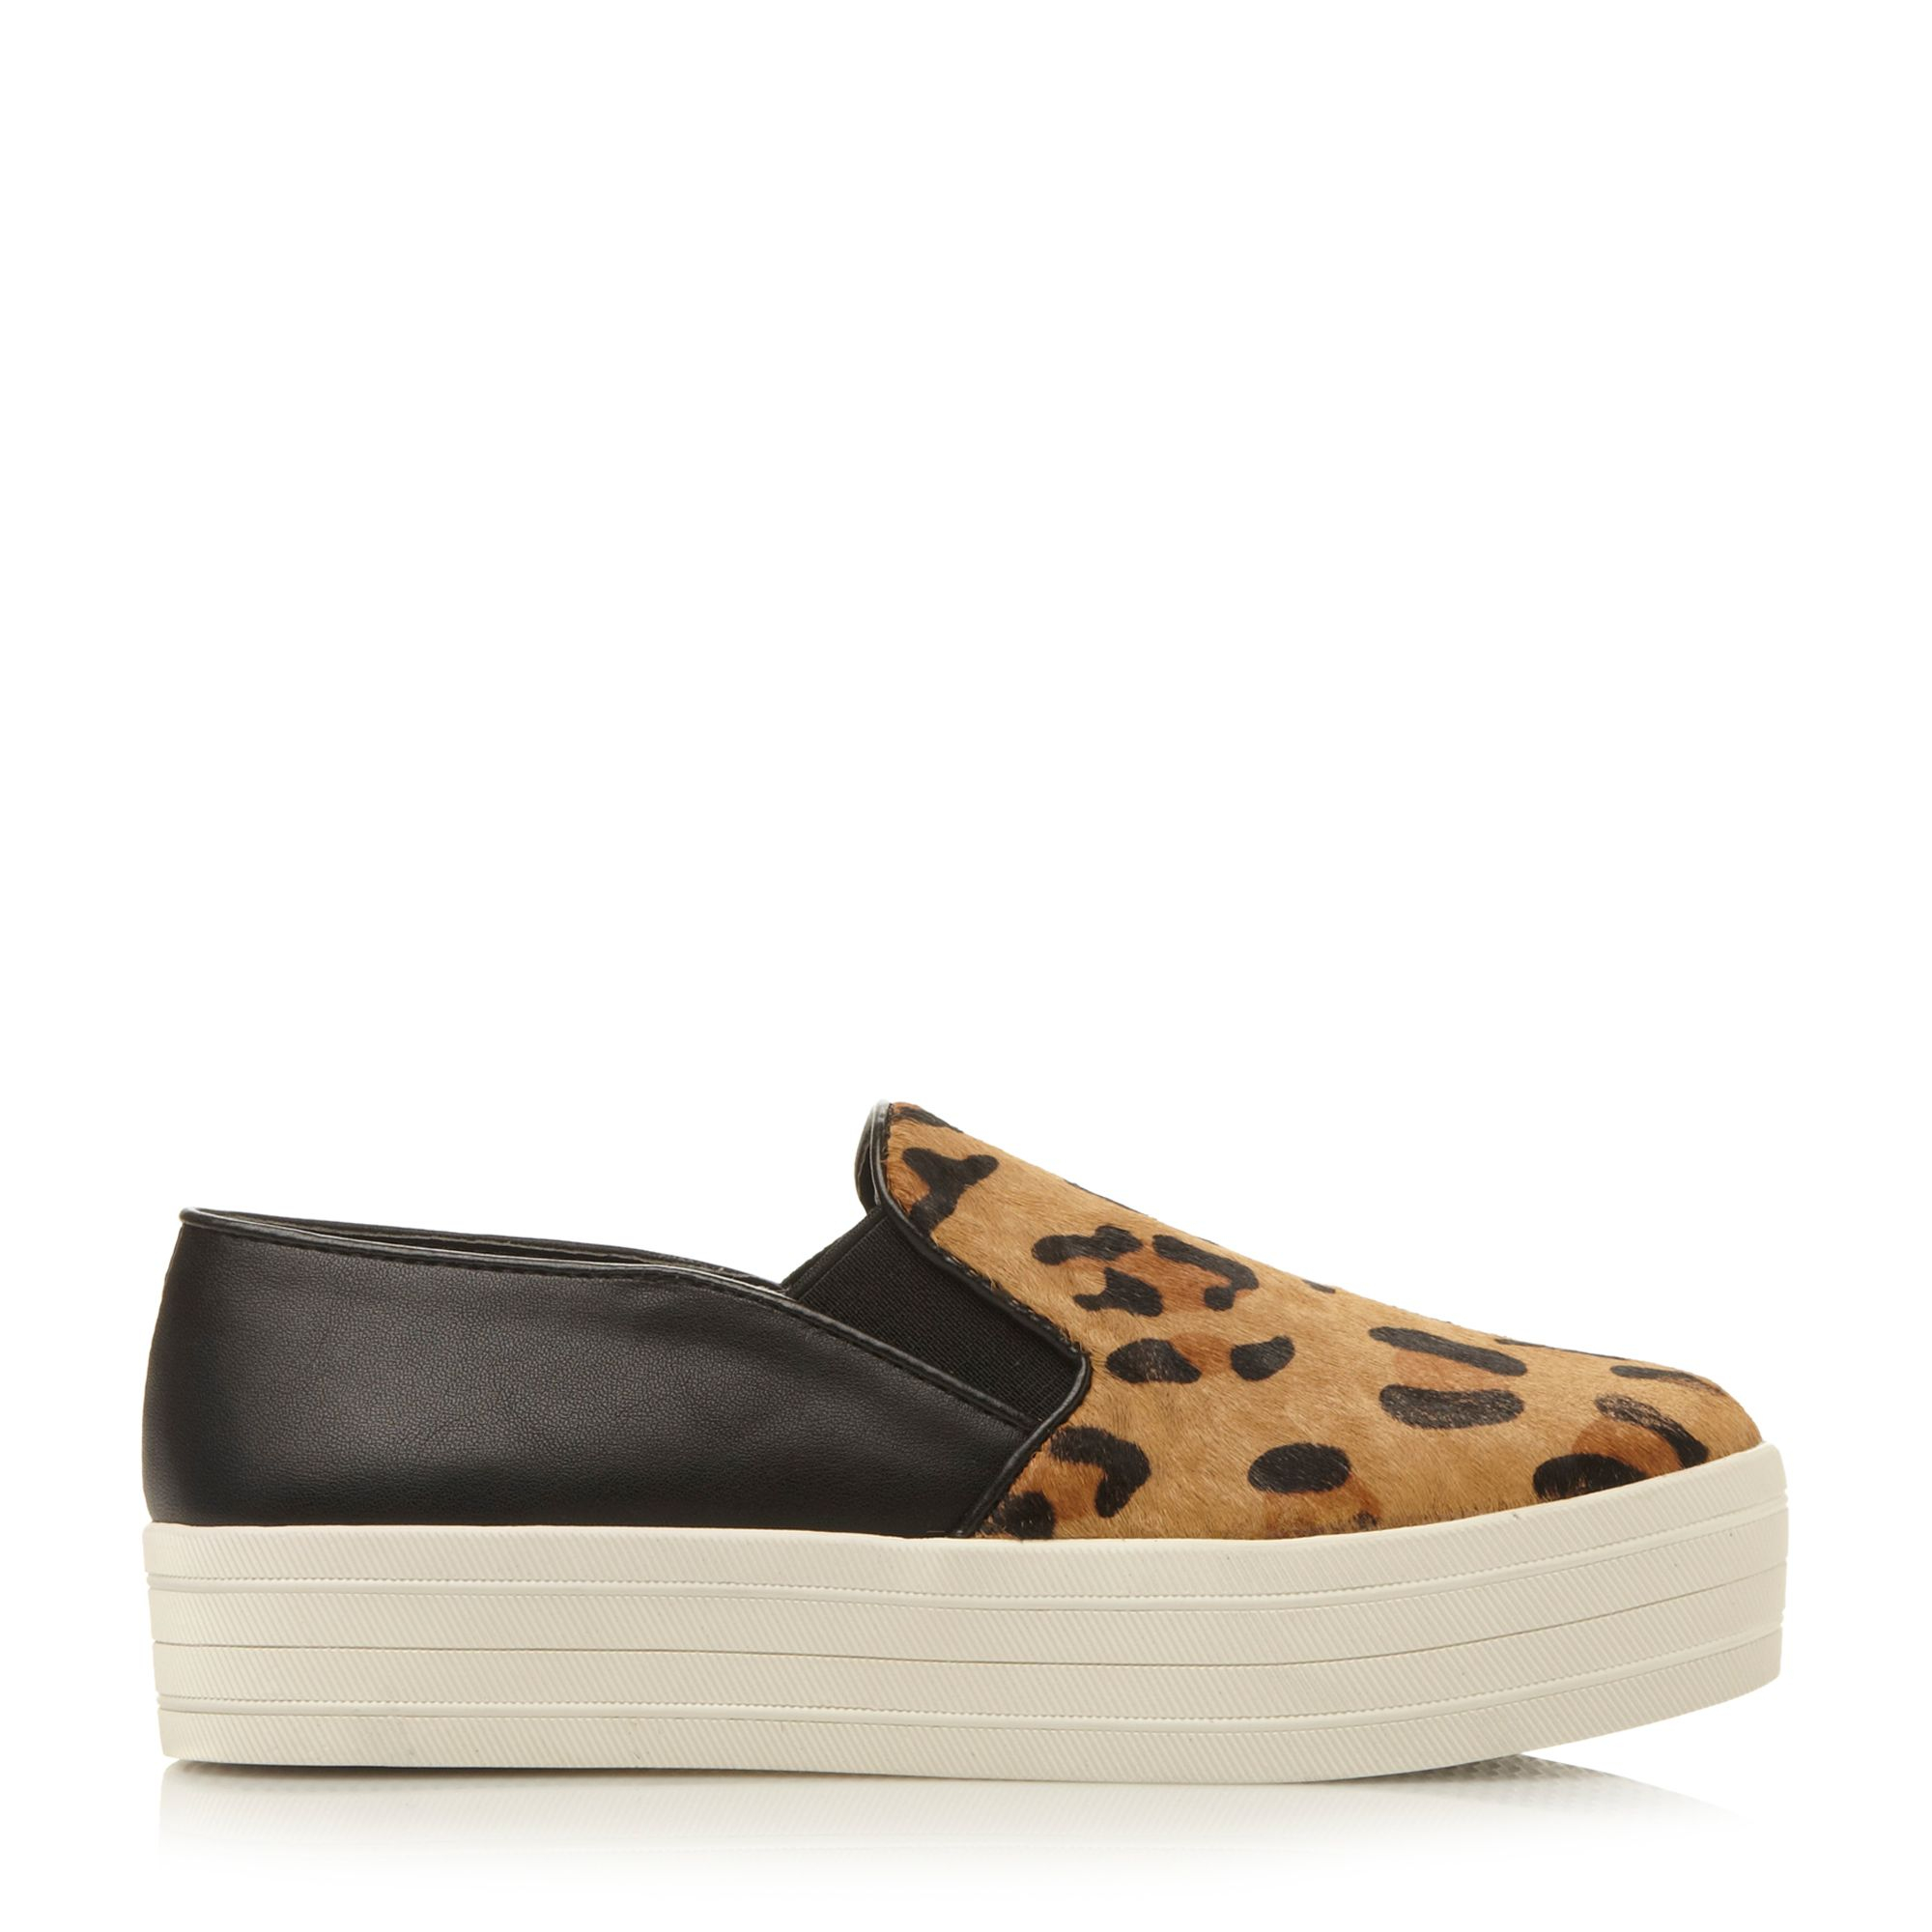 Steve Madden Leopard Print Flat Shoes